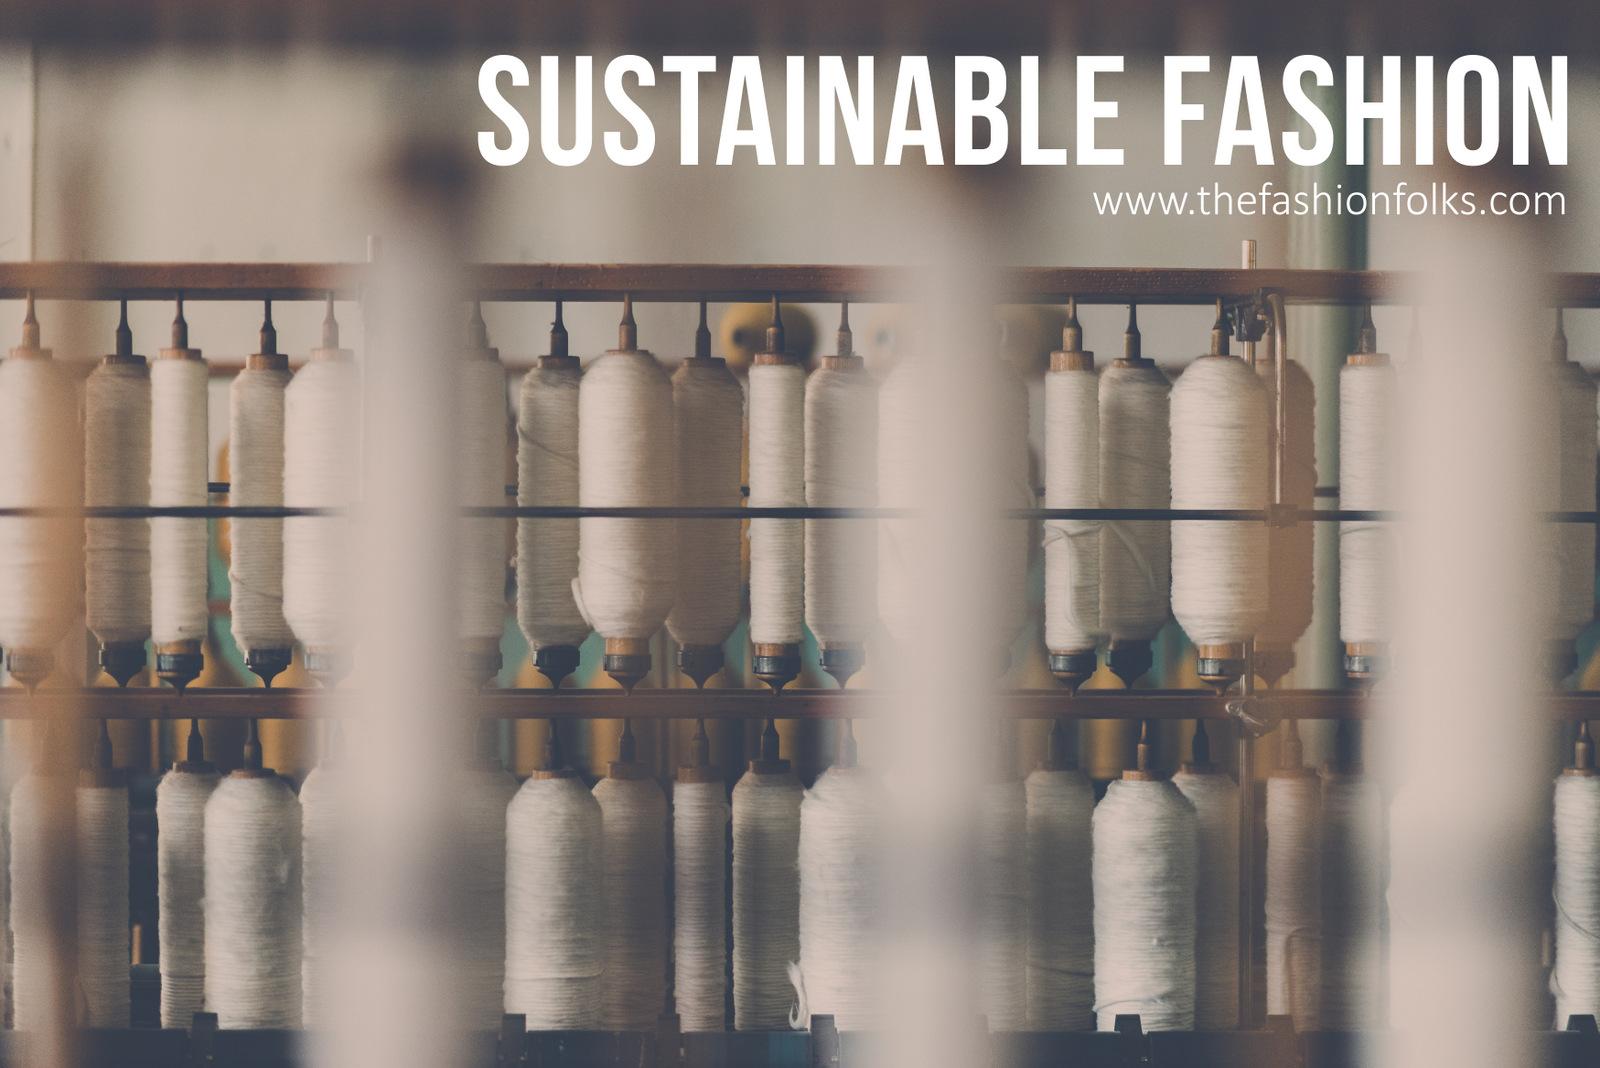 Sustainable Fashion | The Fashion Folks